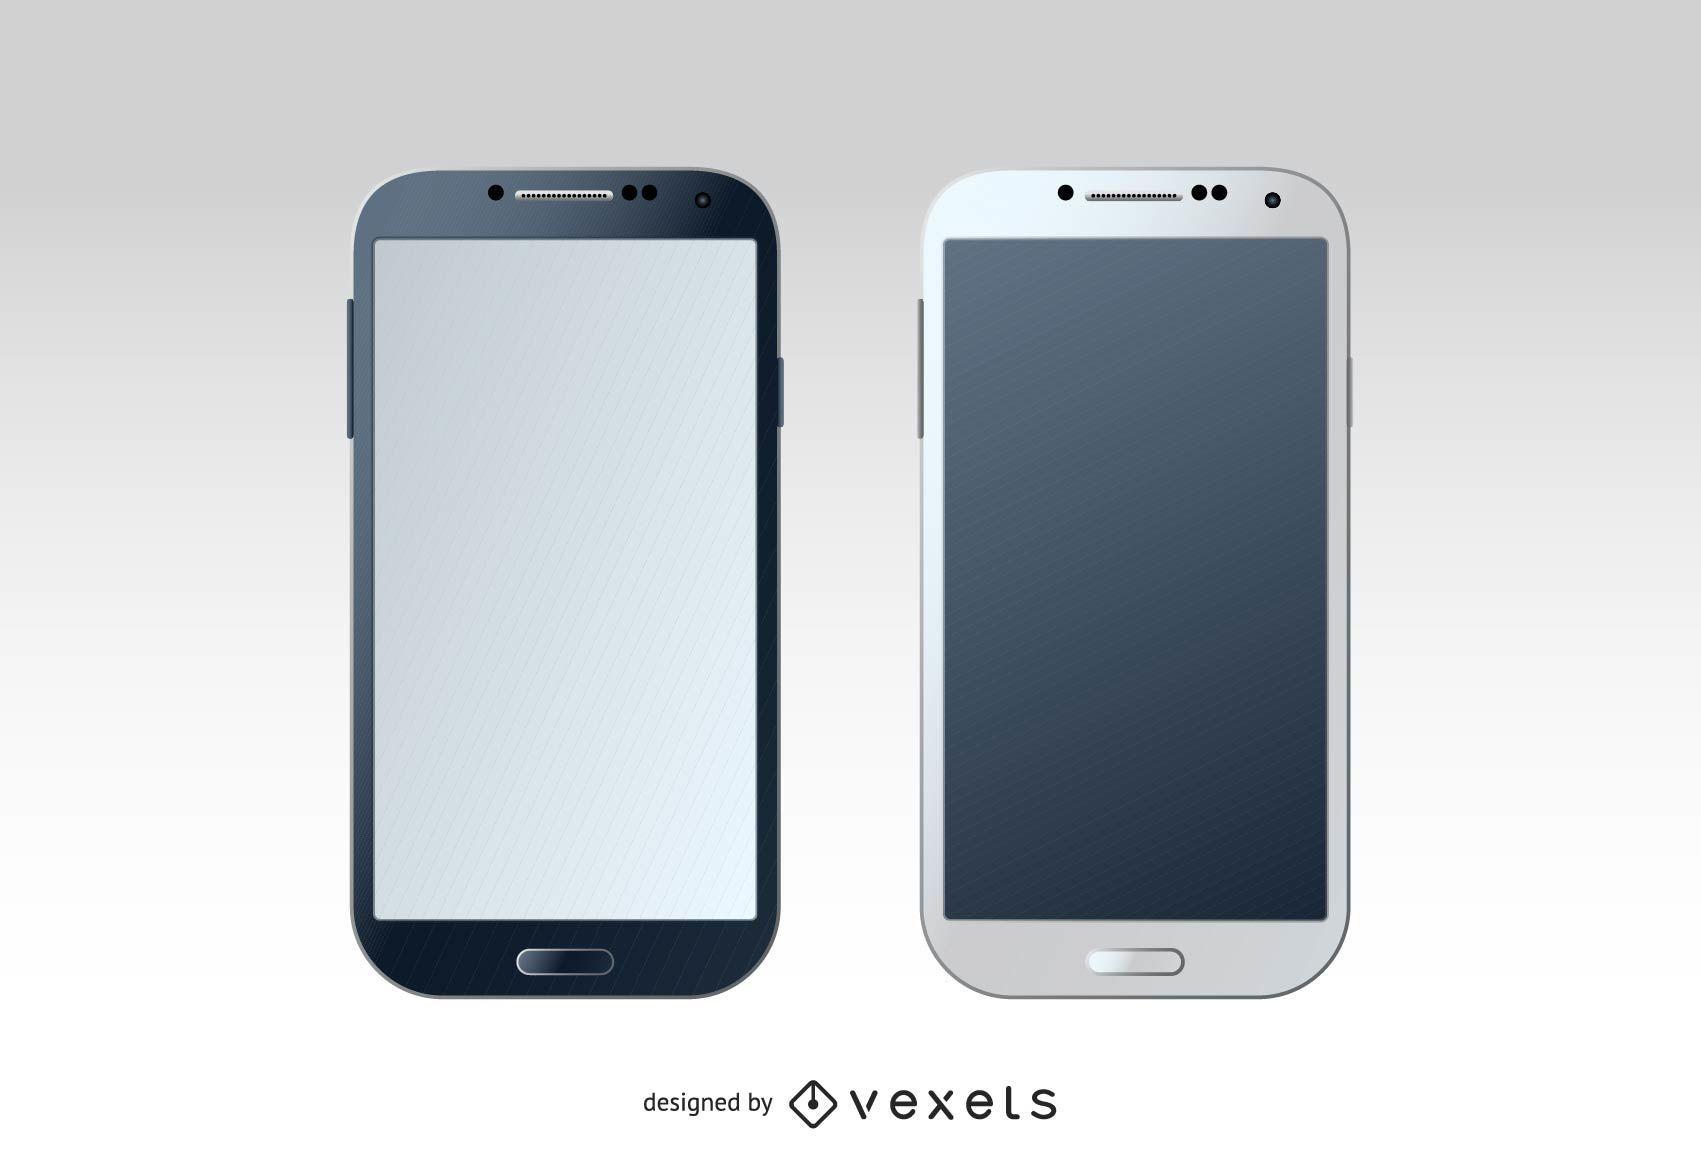 Samsung Galaxy S4 Mockup - Vector download